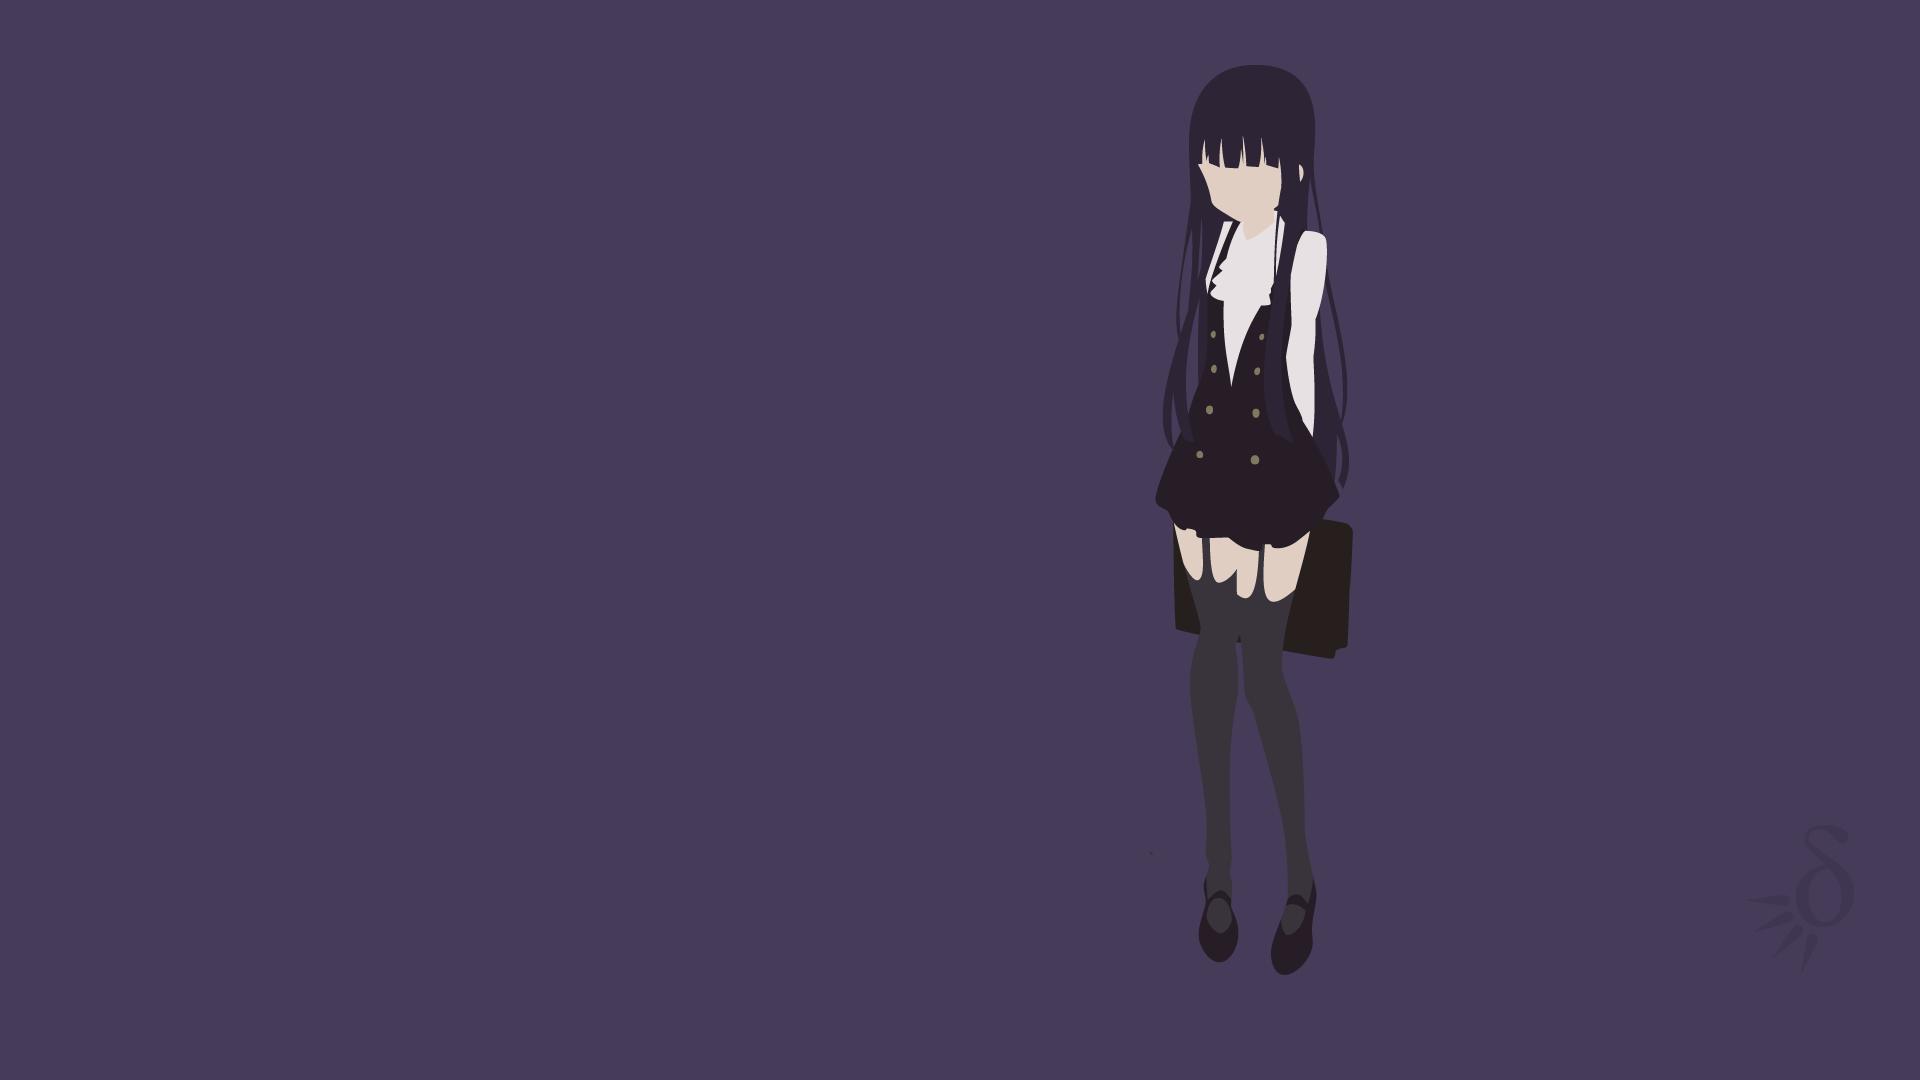 [Request] Inu x Boku SS - Shirakiin Ririchiyo by Krukmeister